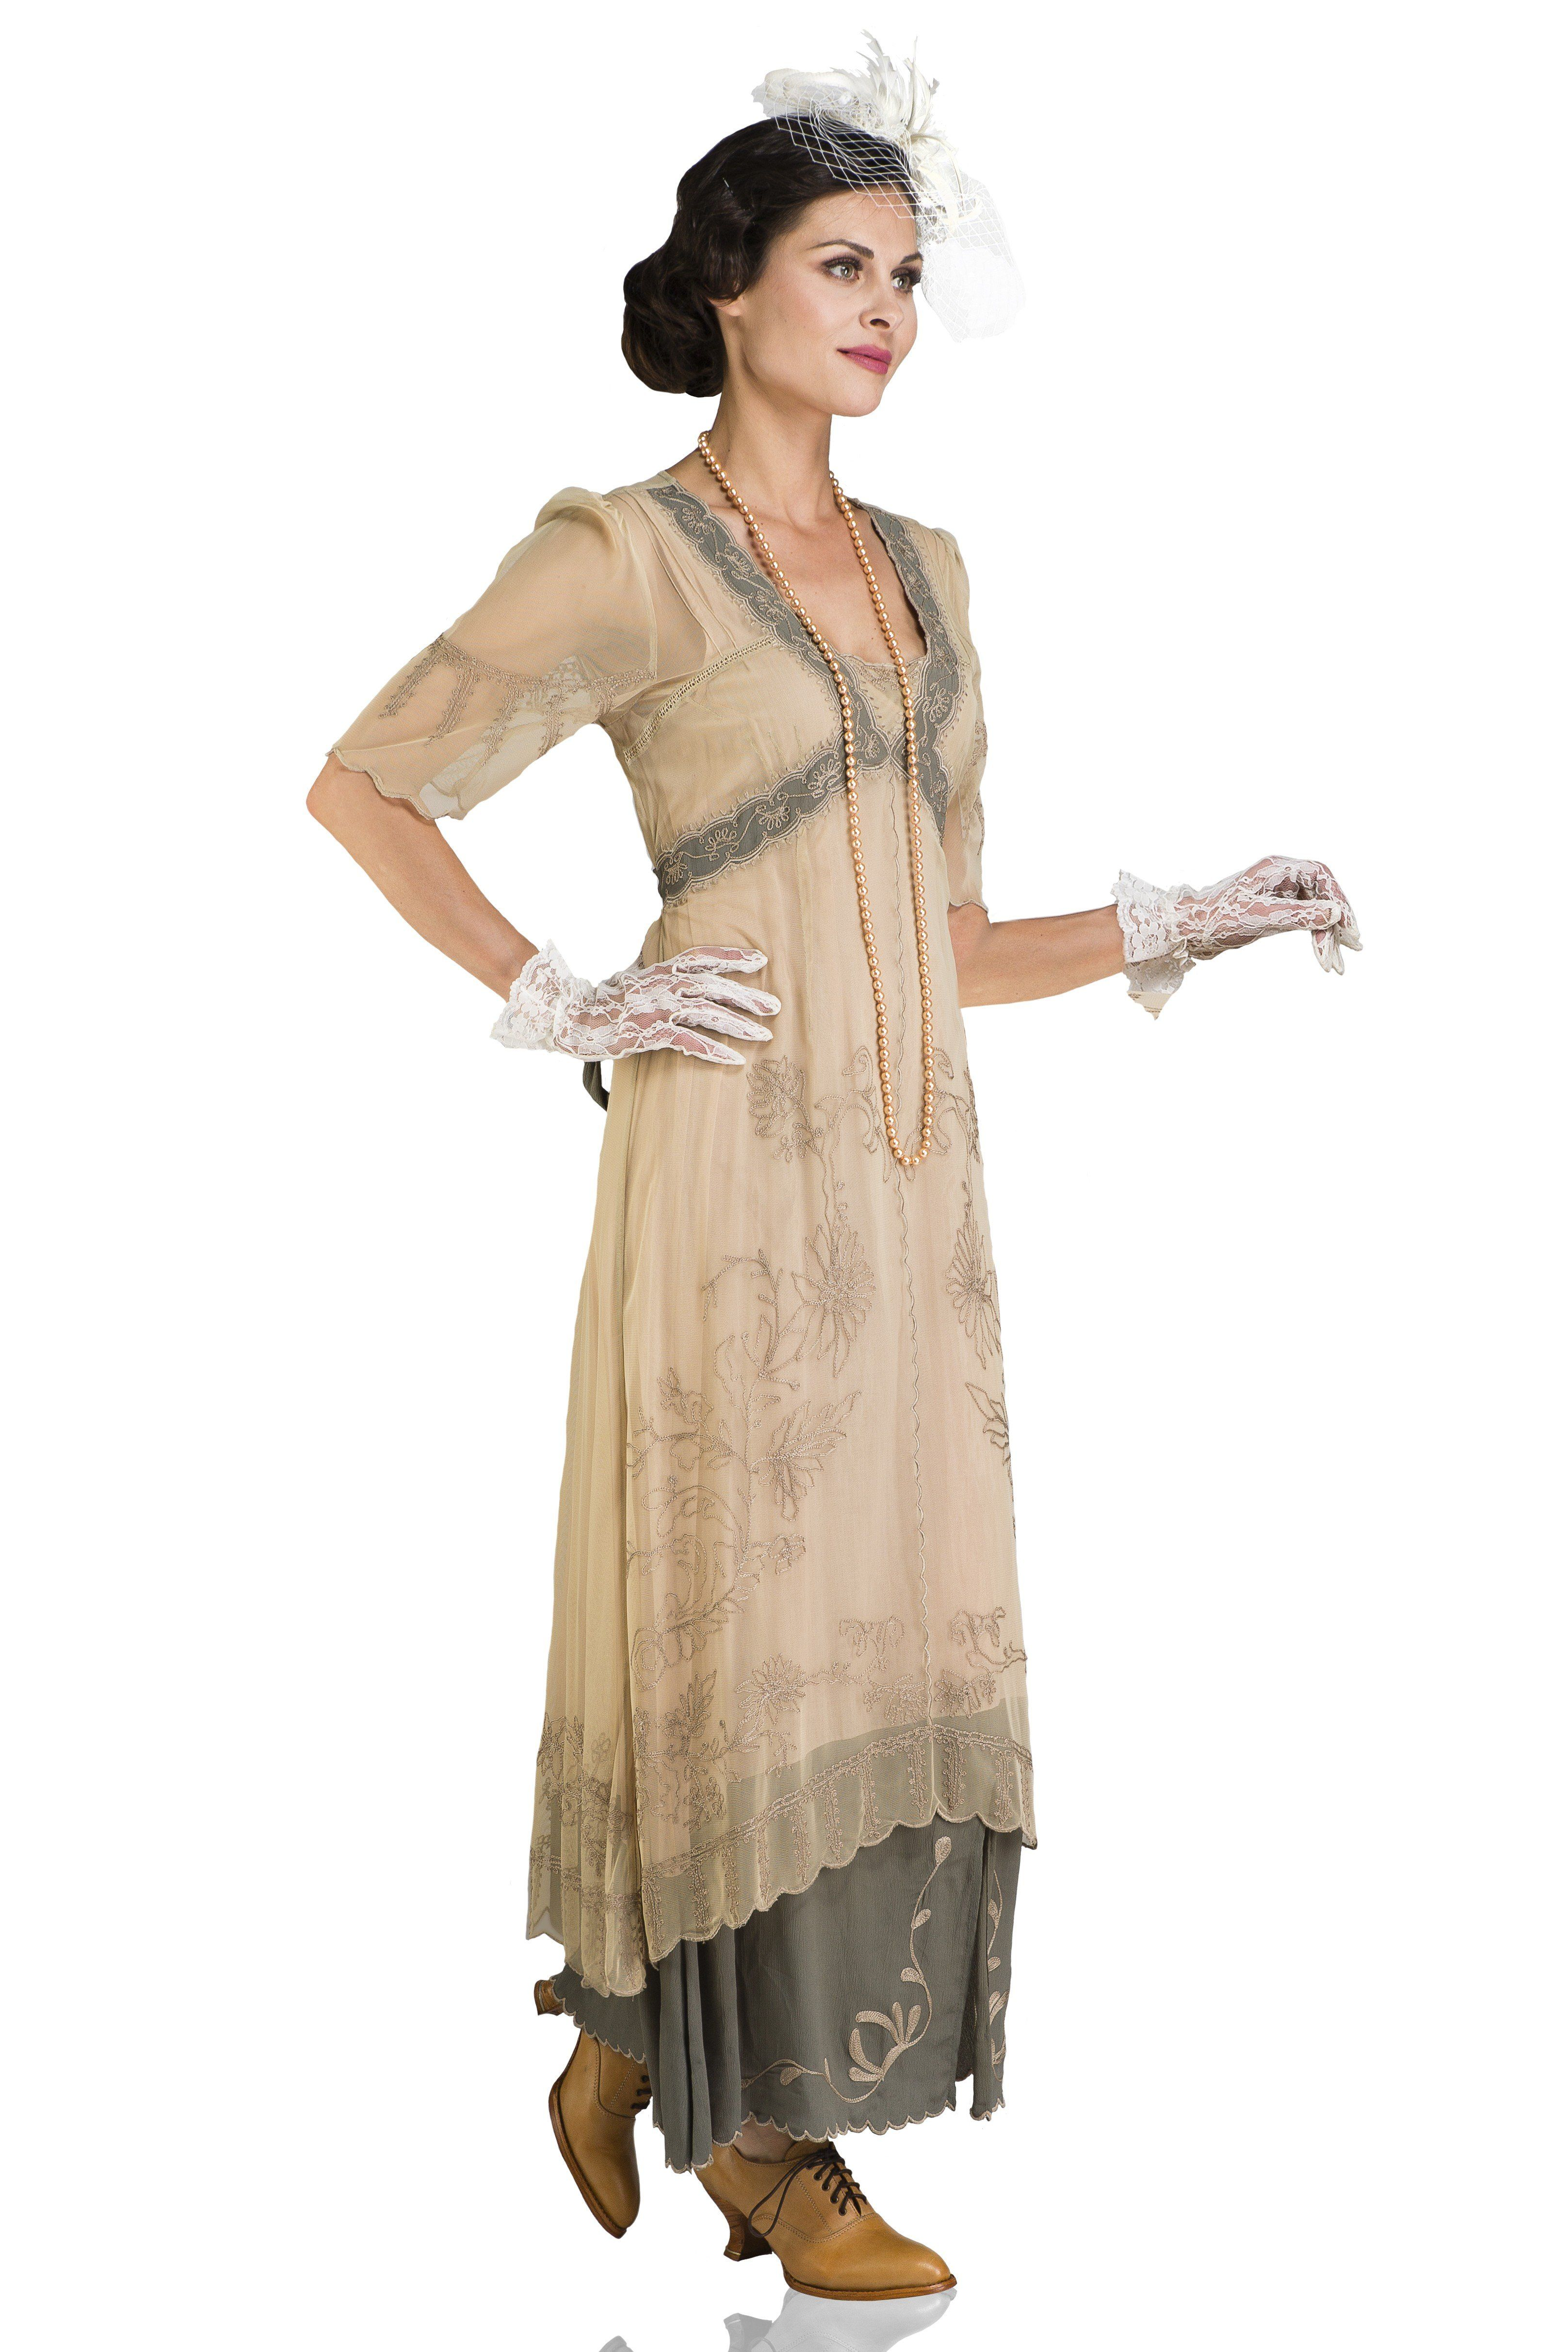 New Vintage Titanic Tea Party Dress In Sage By Nataya In 2021 Tea Party Dress Dresses Informal Wedding Dresses [ 4850 x 3233 Pixel ]